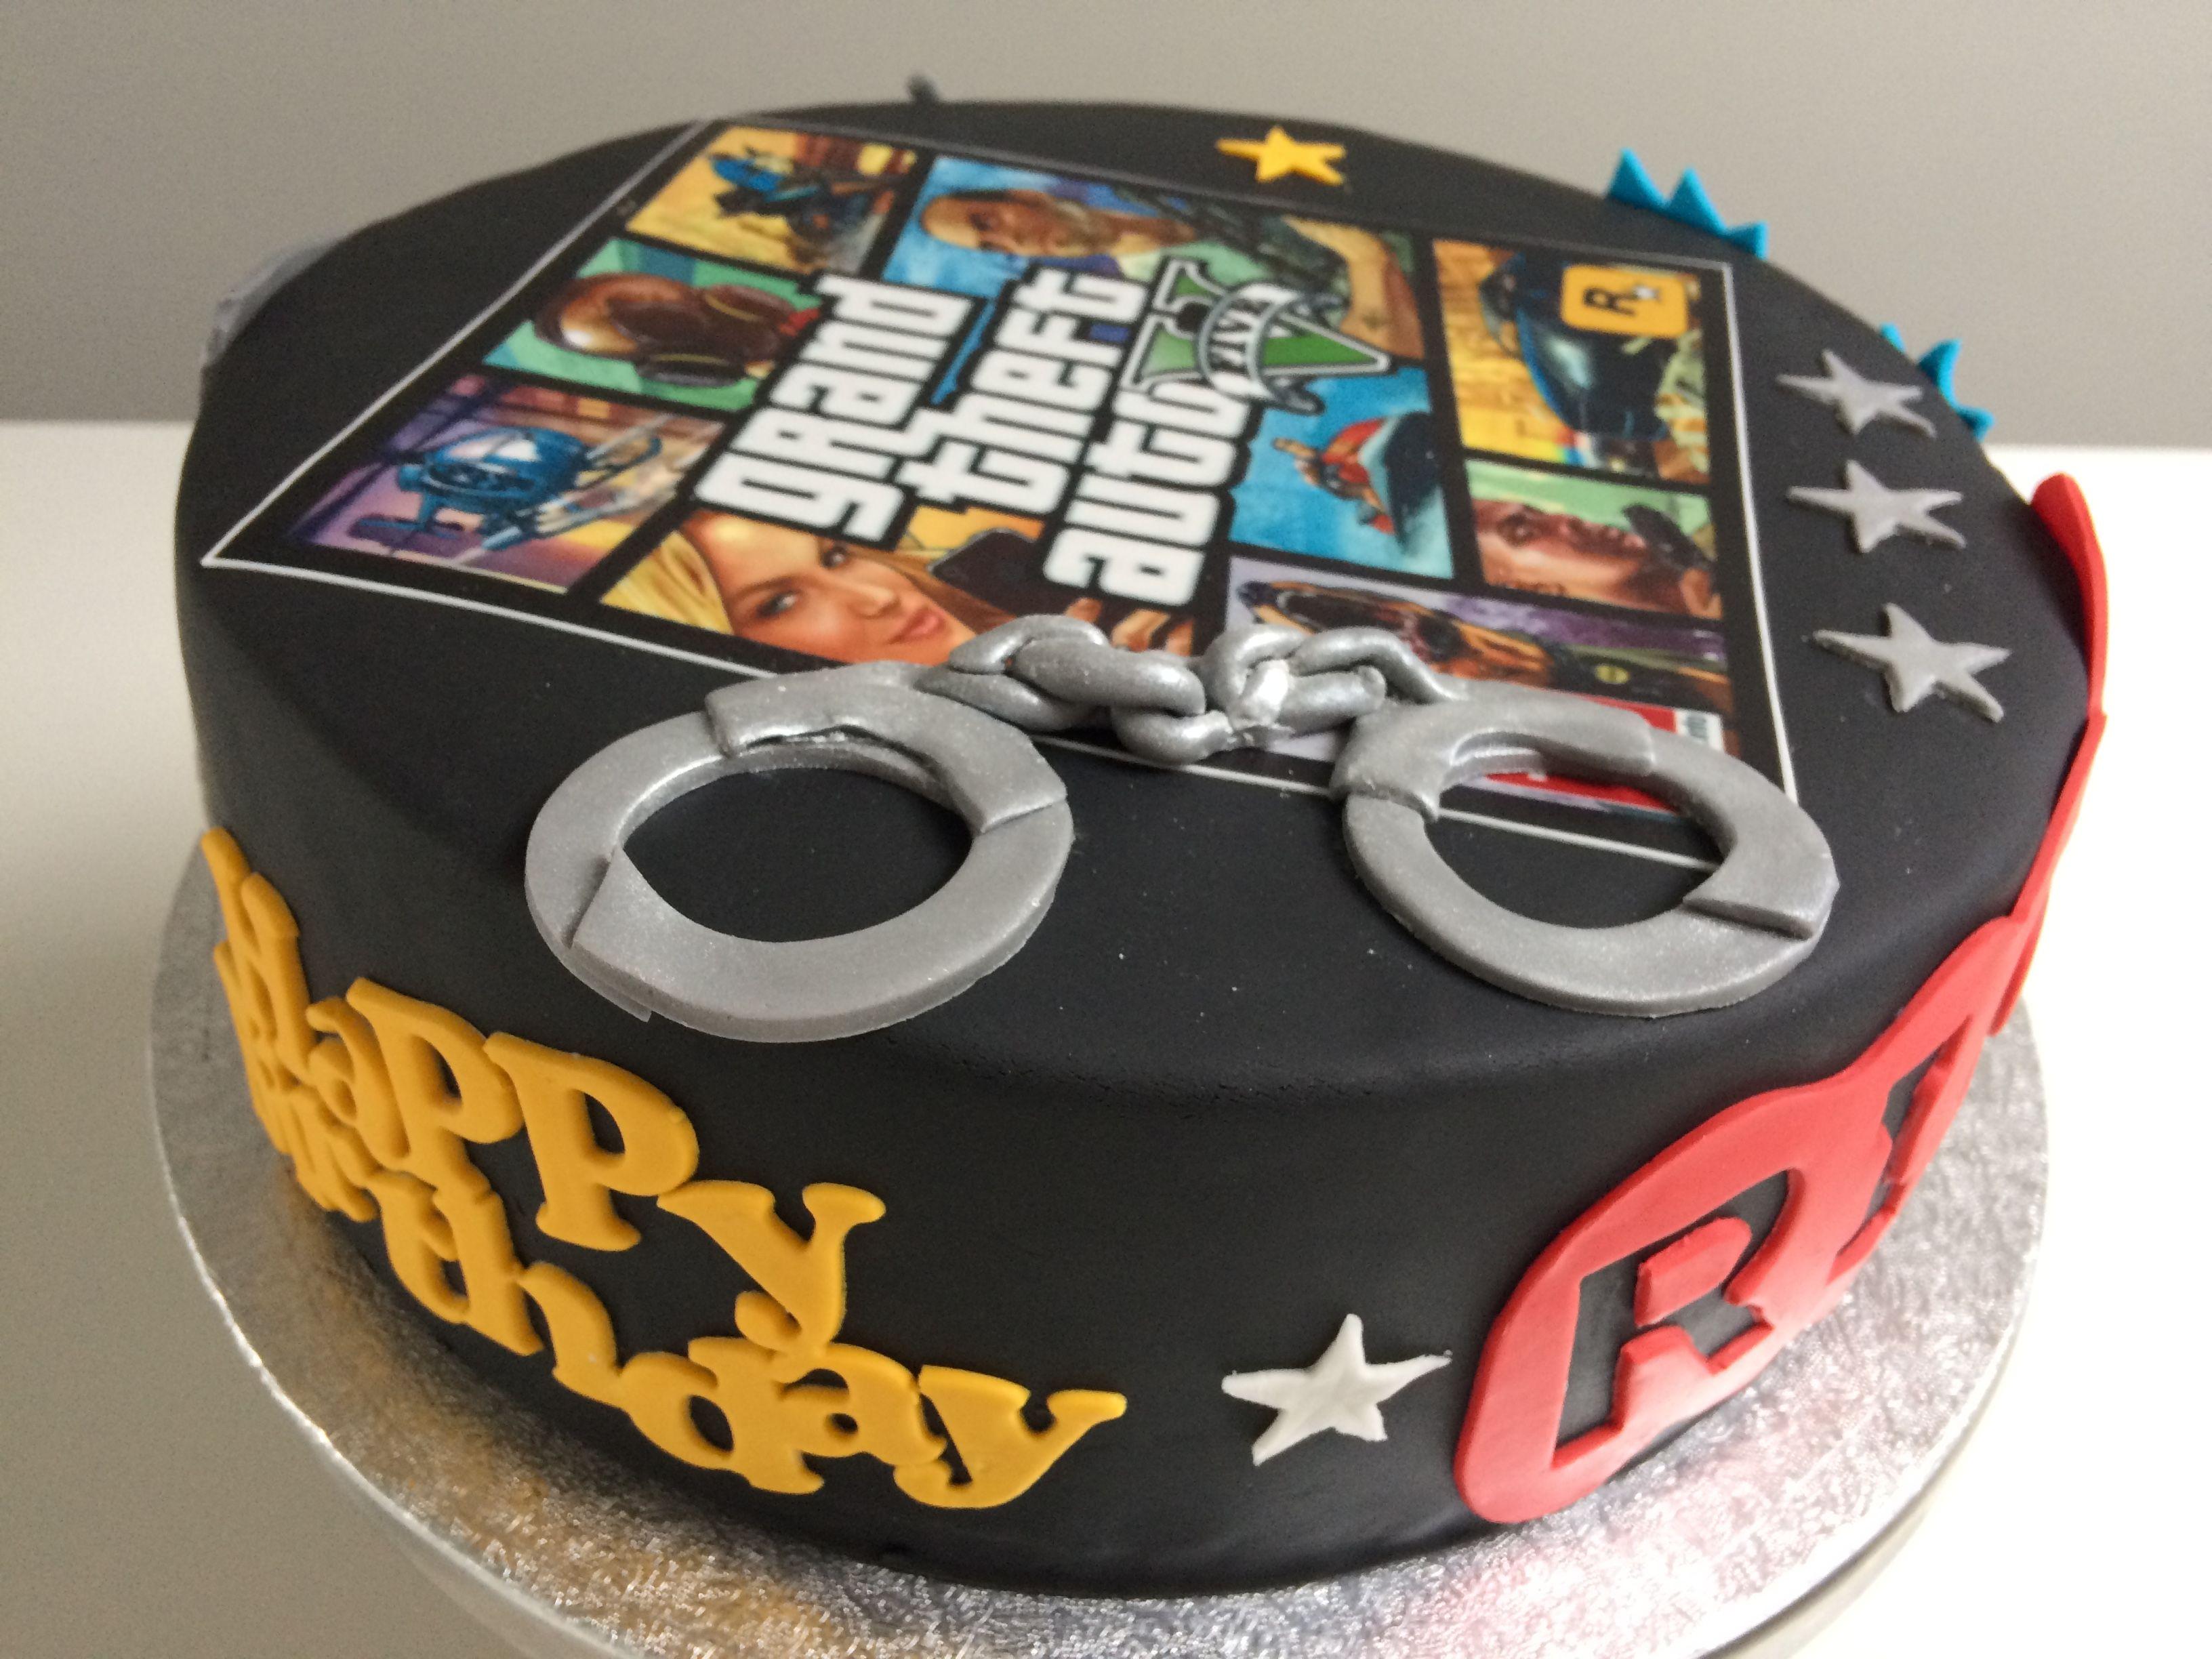 Grand Theft Auto V Cake Torribellebakery Cake Cake Desserts